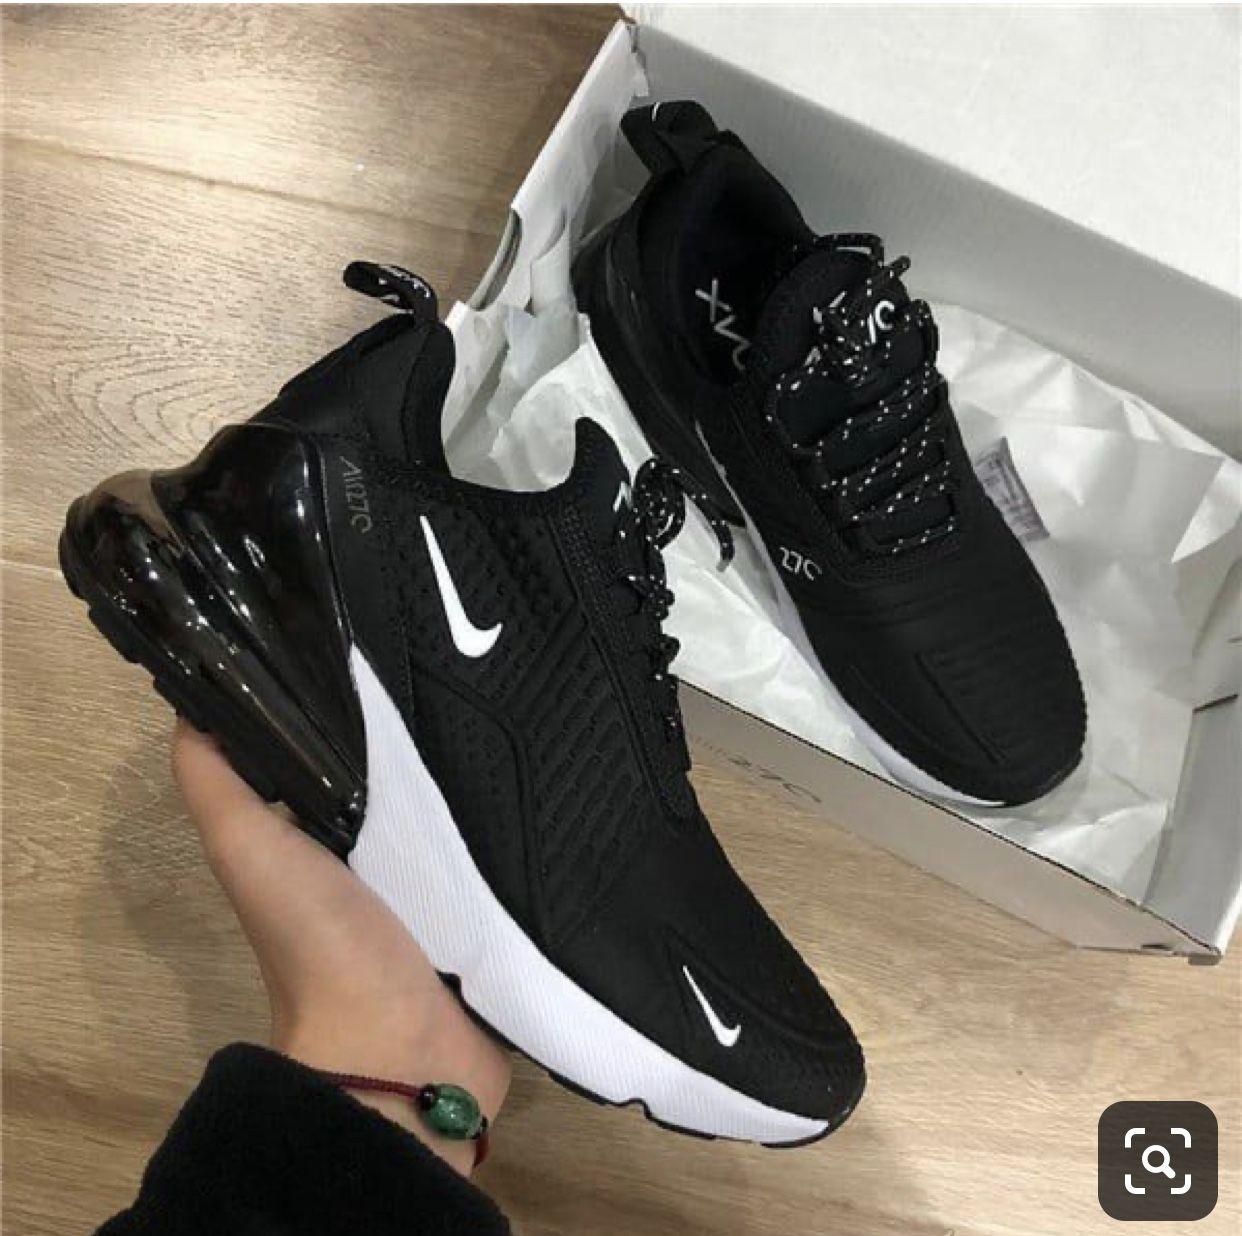 Comprar Hombre Nike Air Max 2020 Zapatillas Negras Blancas